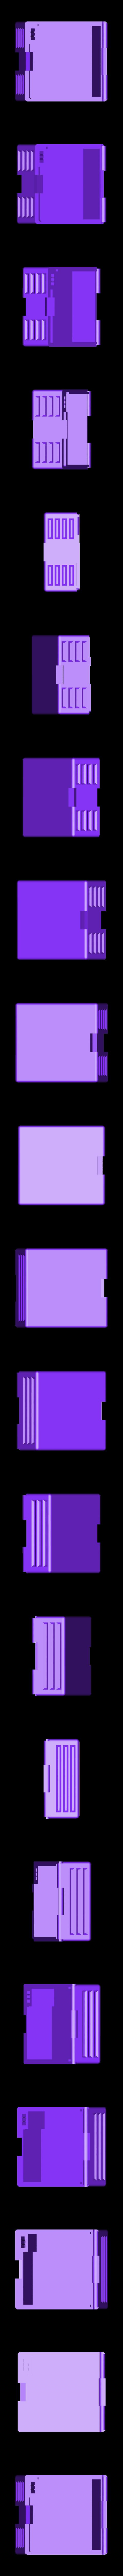 smw_dol.stl Download free STL file 3DConnexion SpaceMouse Wireless BOX • 3D printing template, kpawel